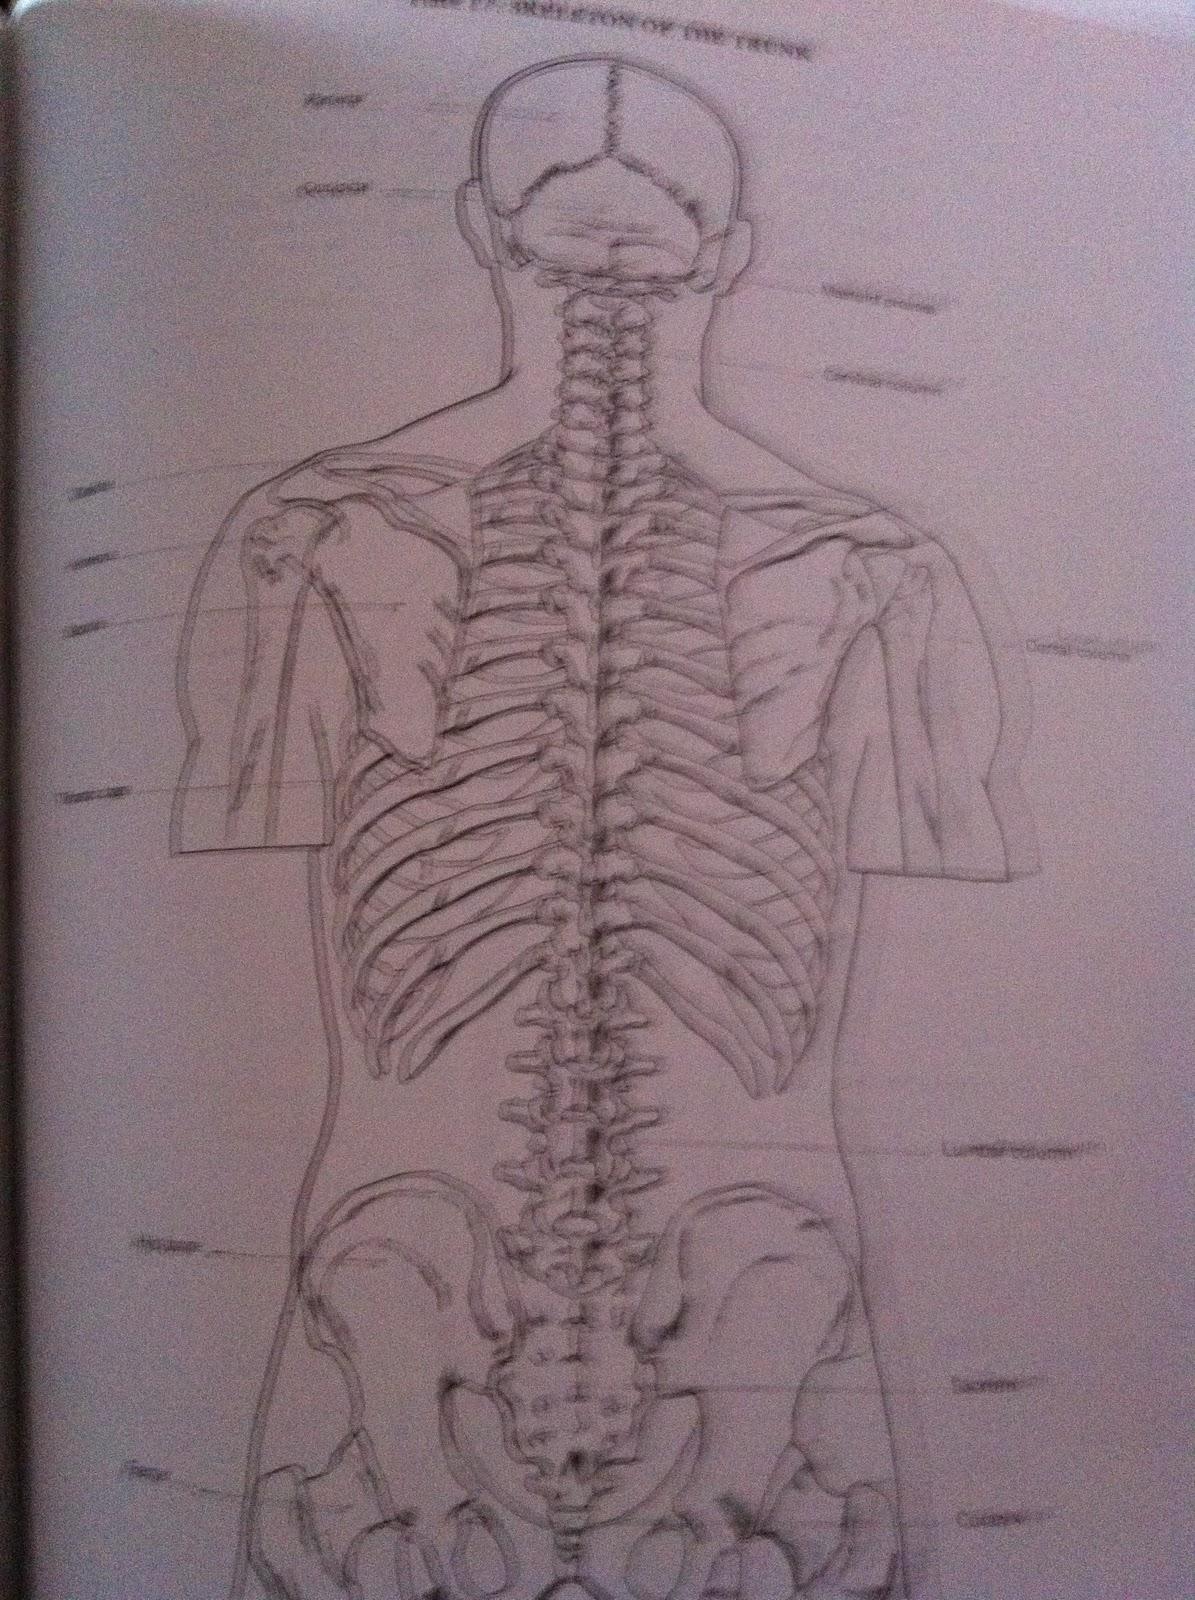 Artistic anatomy by dr paul richer